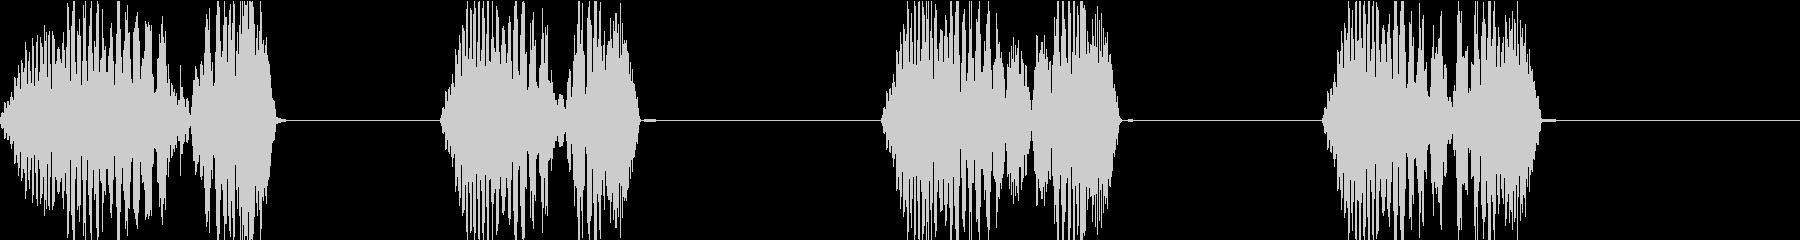 DJプレイ スクラッチ・ノイズ 164の未再生の波形